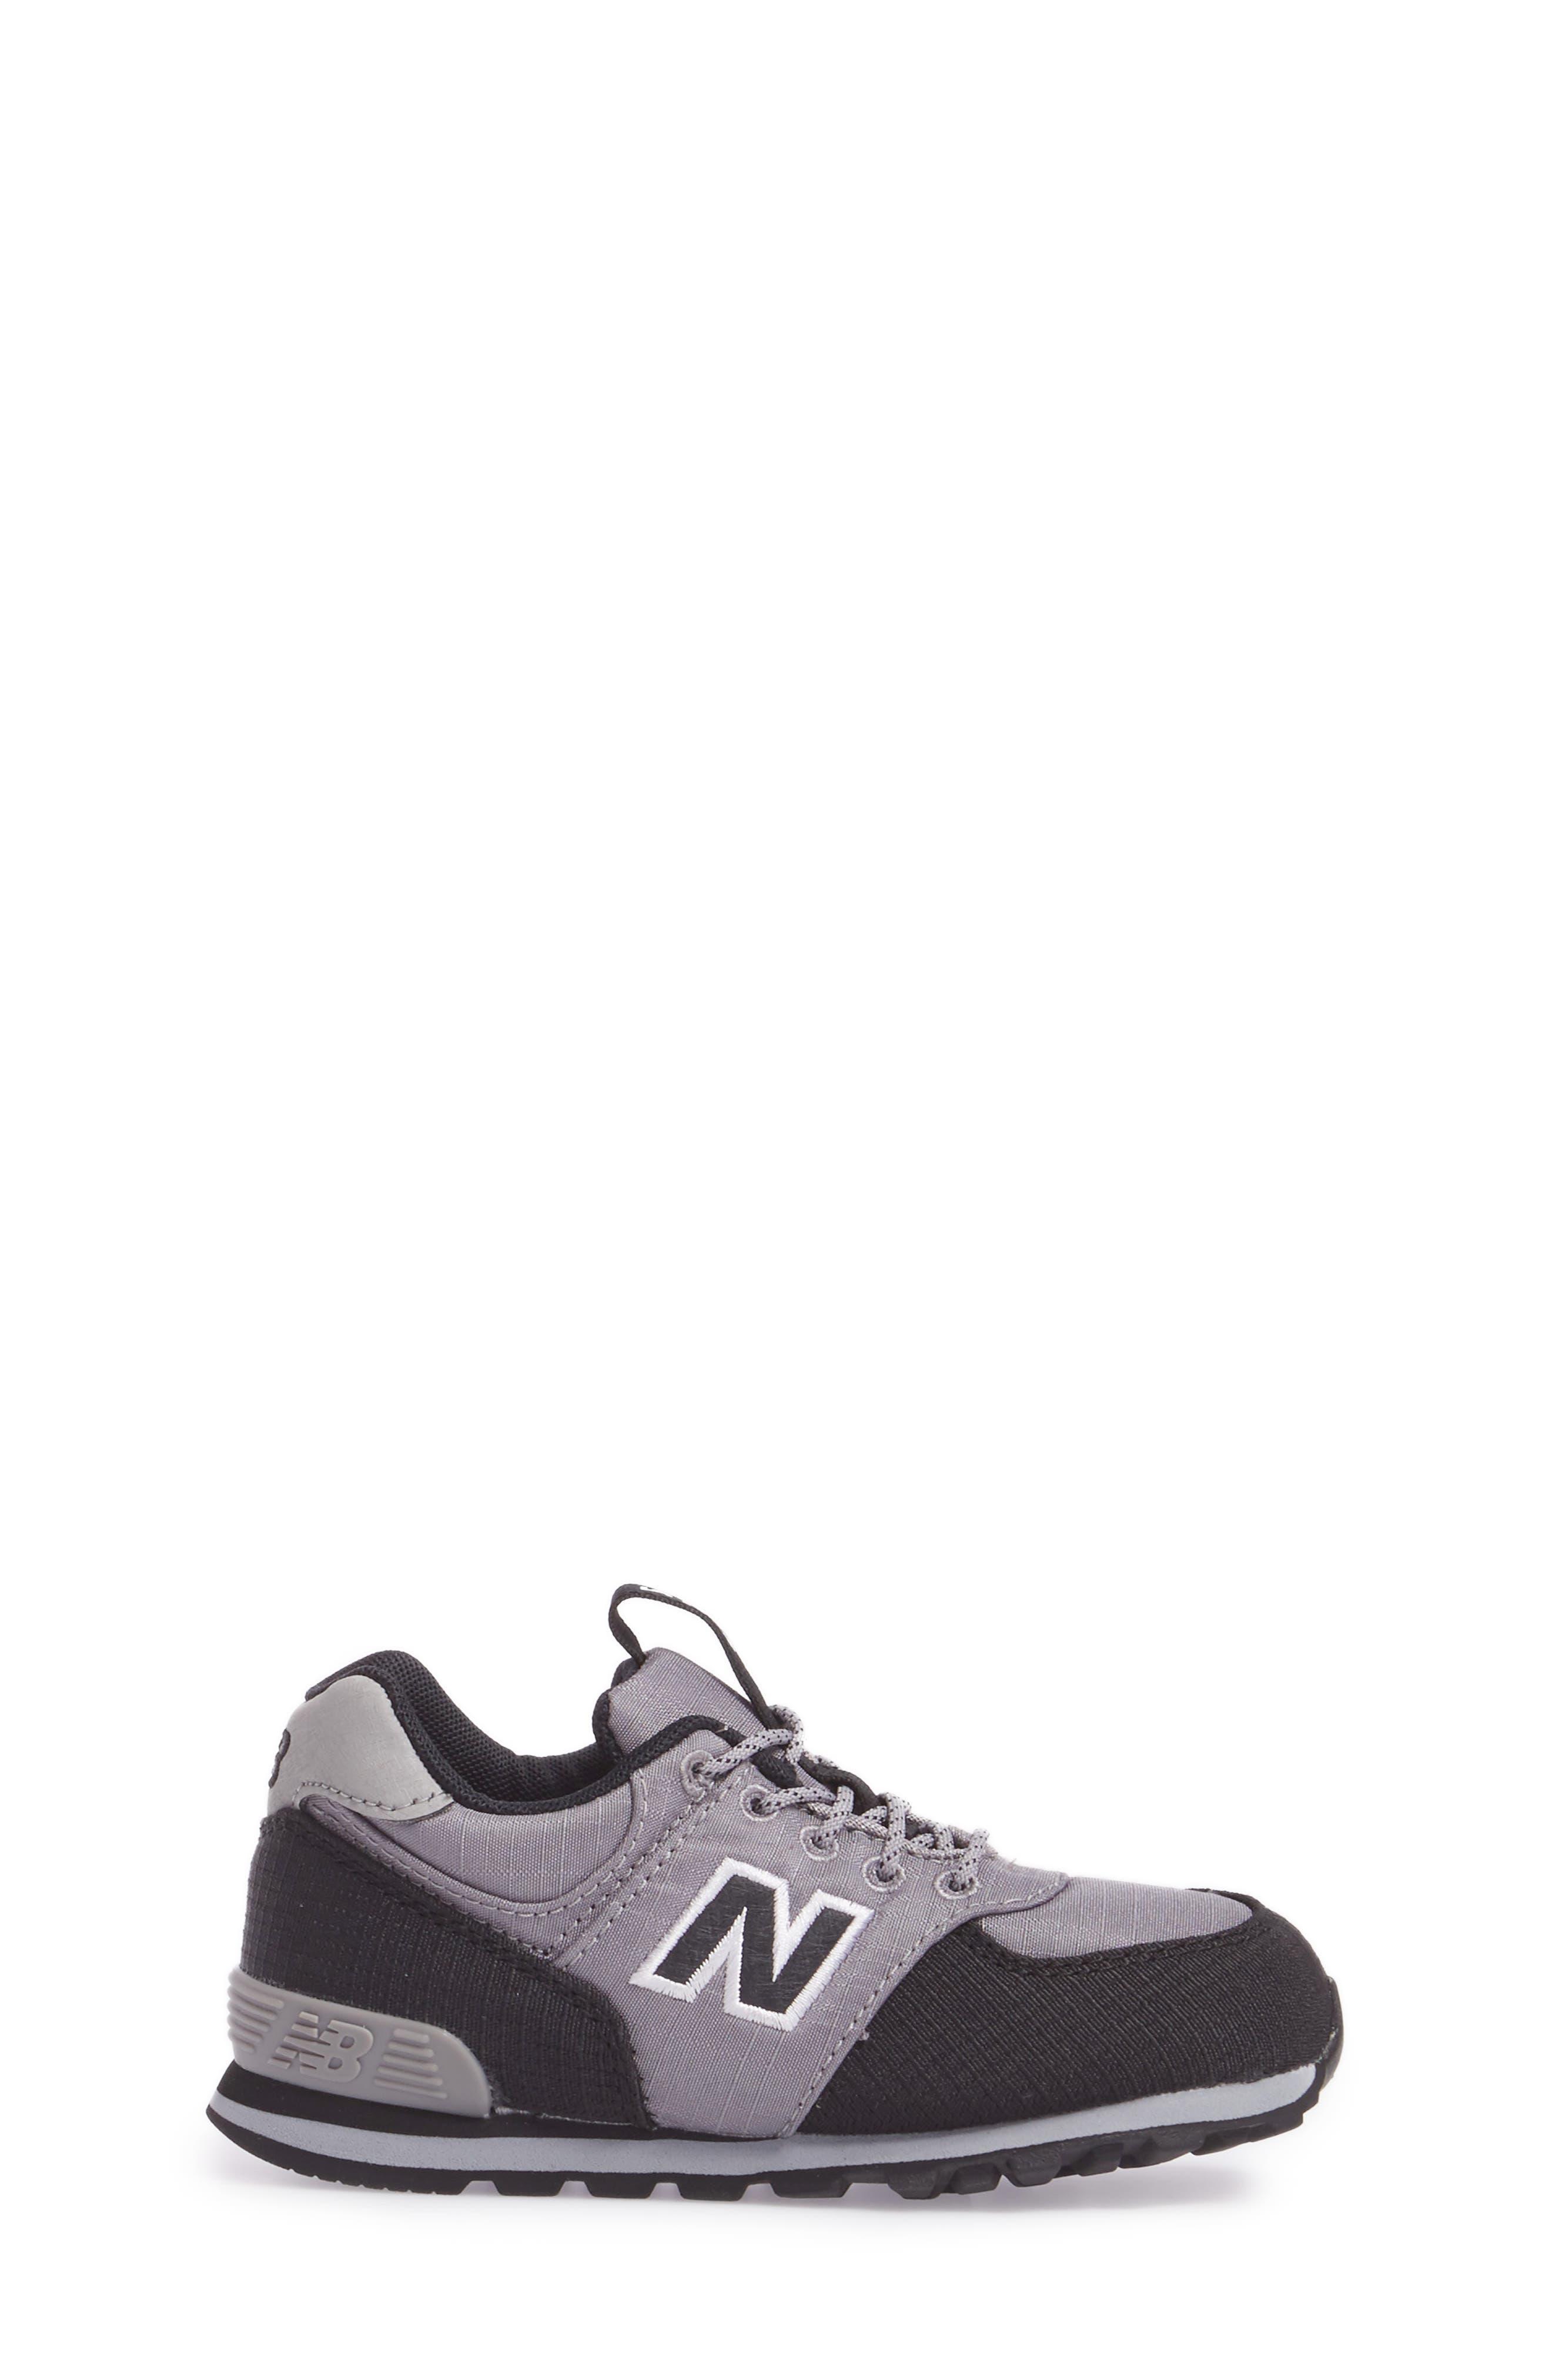 574 Sneaker,                             Alternate thumbnail 3, color,                             Grey